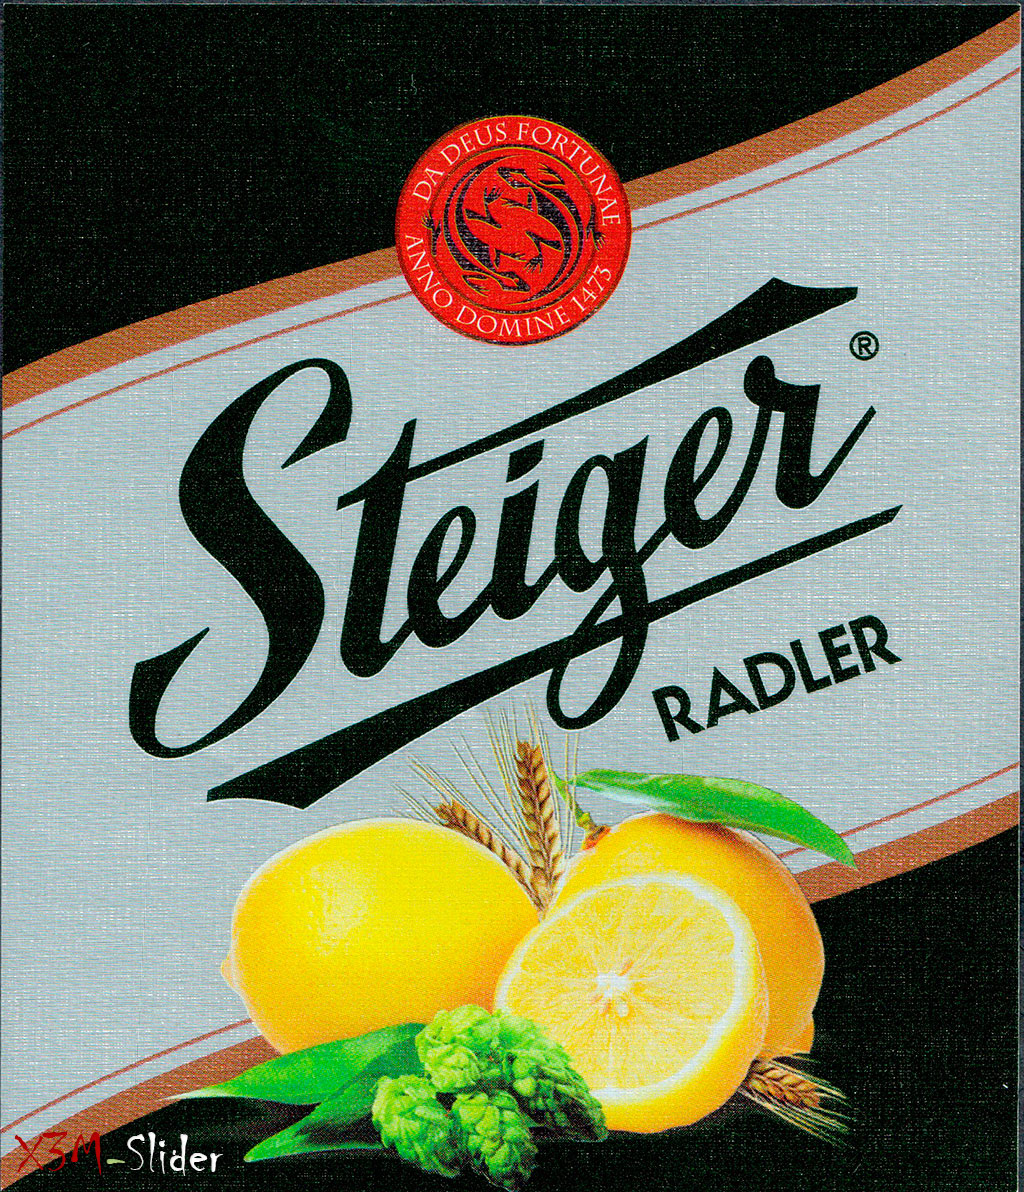 Steiger - Radler